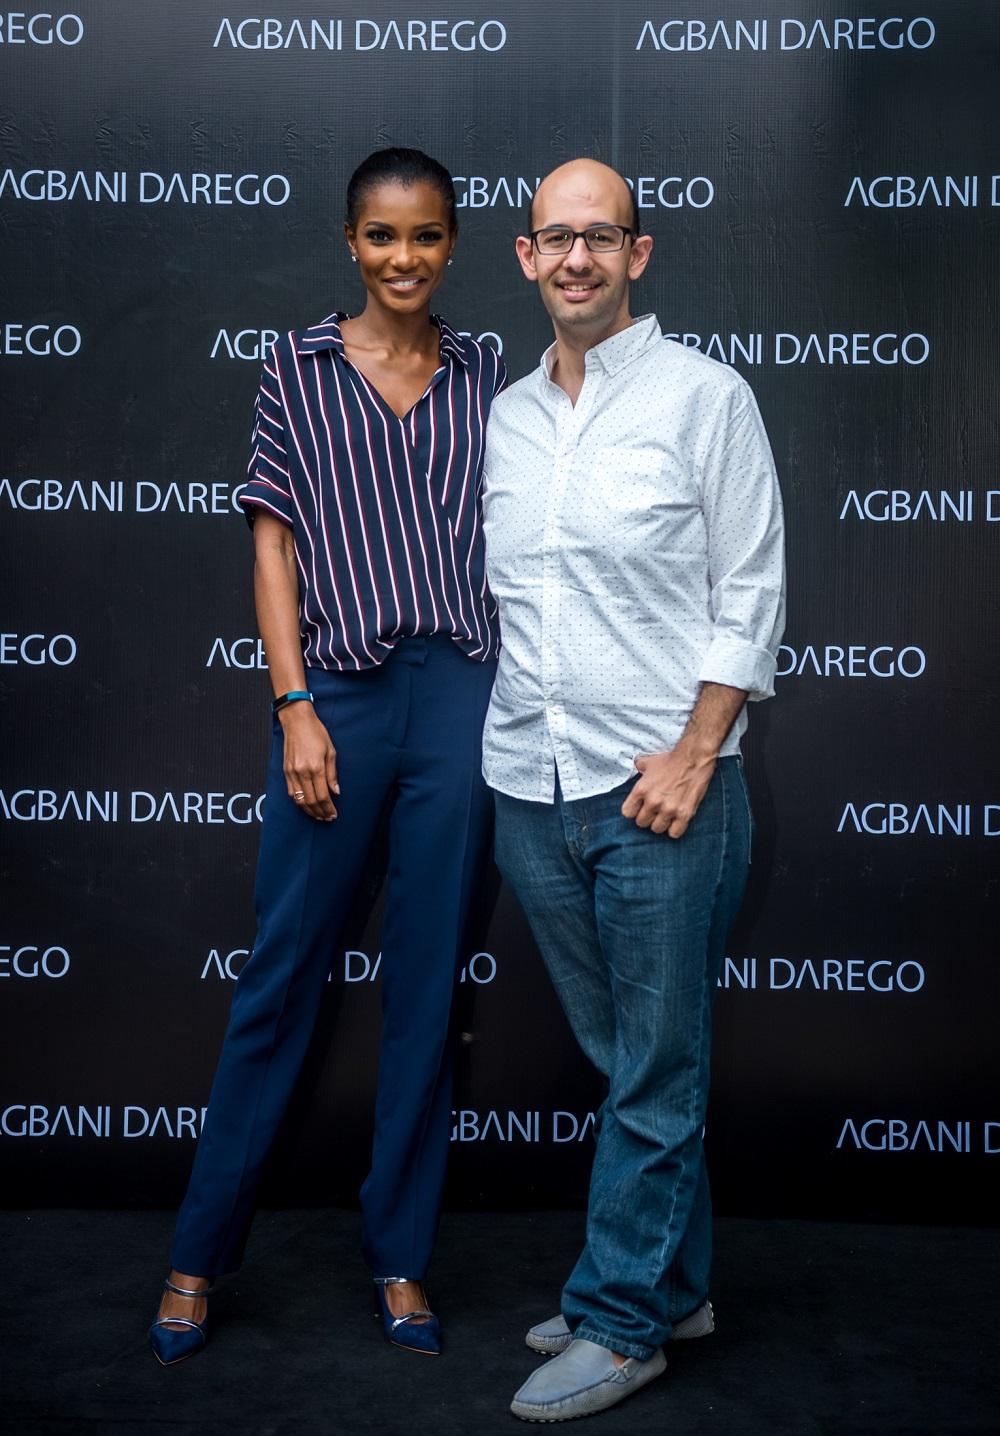 The Evolution of Agbani Darego: Model, Muse, Designer